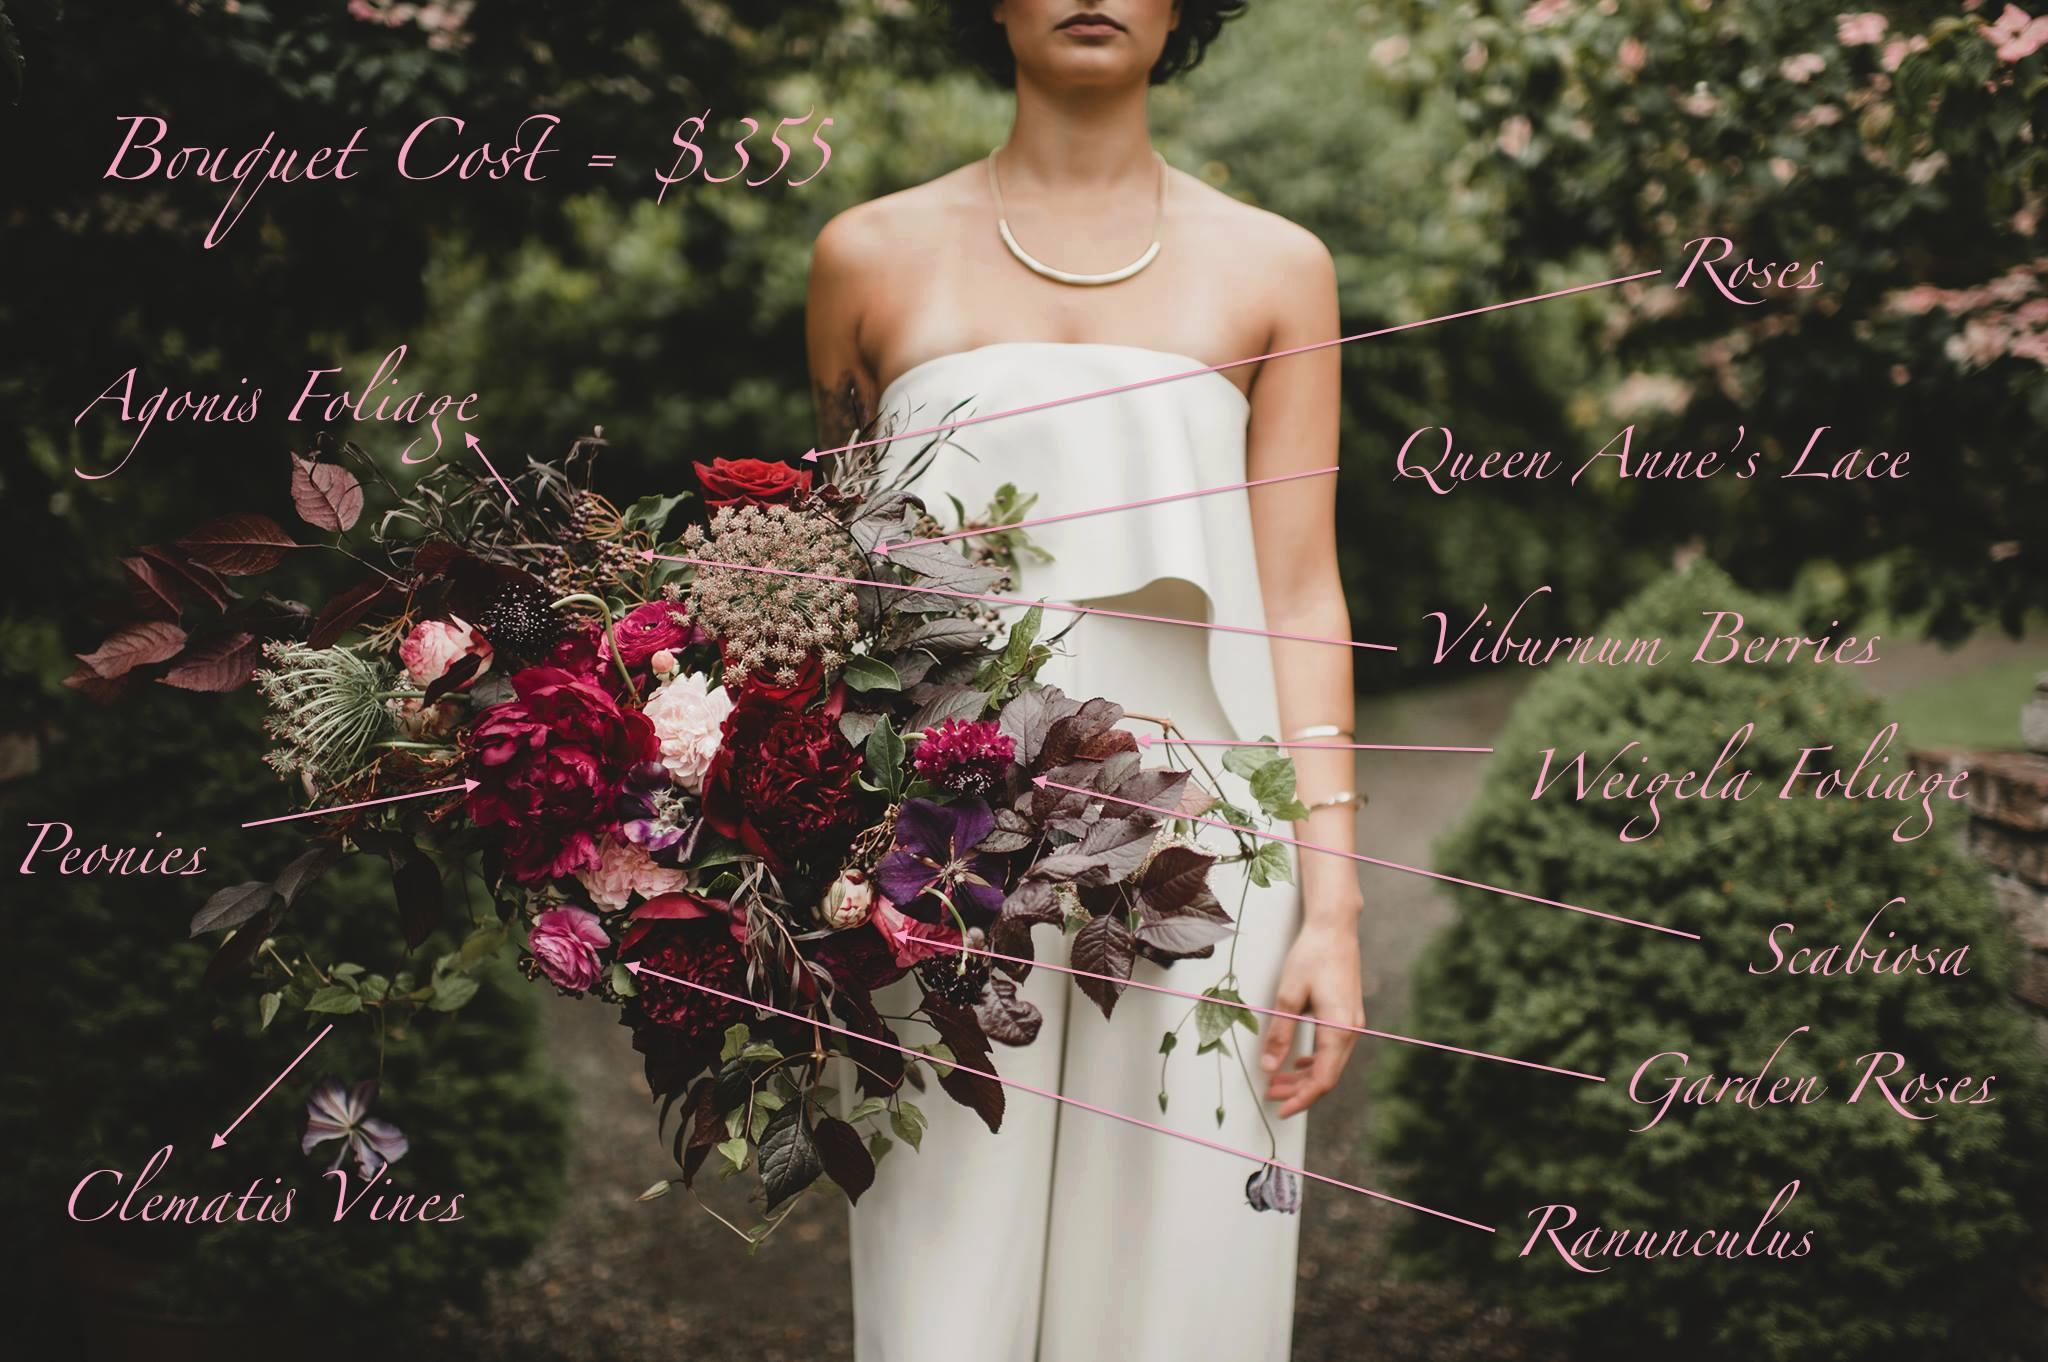 Cost of bridal bouquet: dark peonies, roses, weigela, agonis, clematis - by Flora Nova Design Seattle